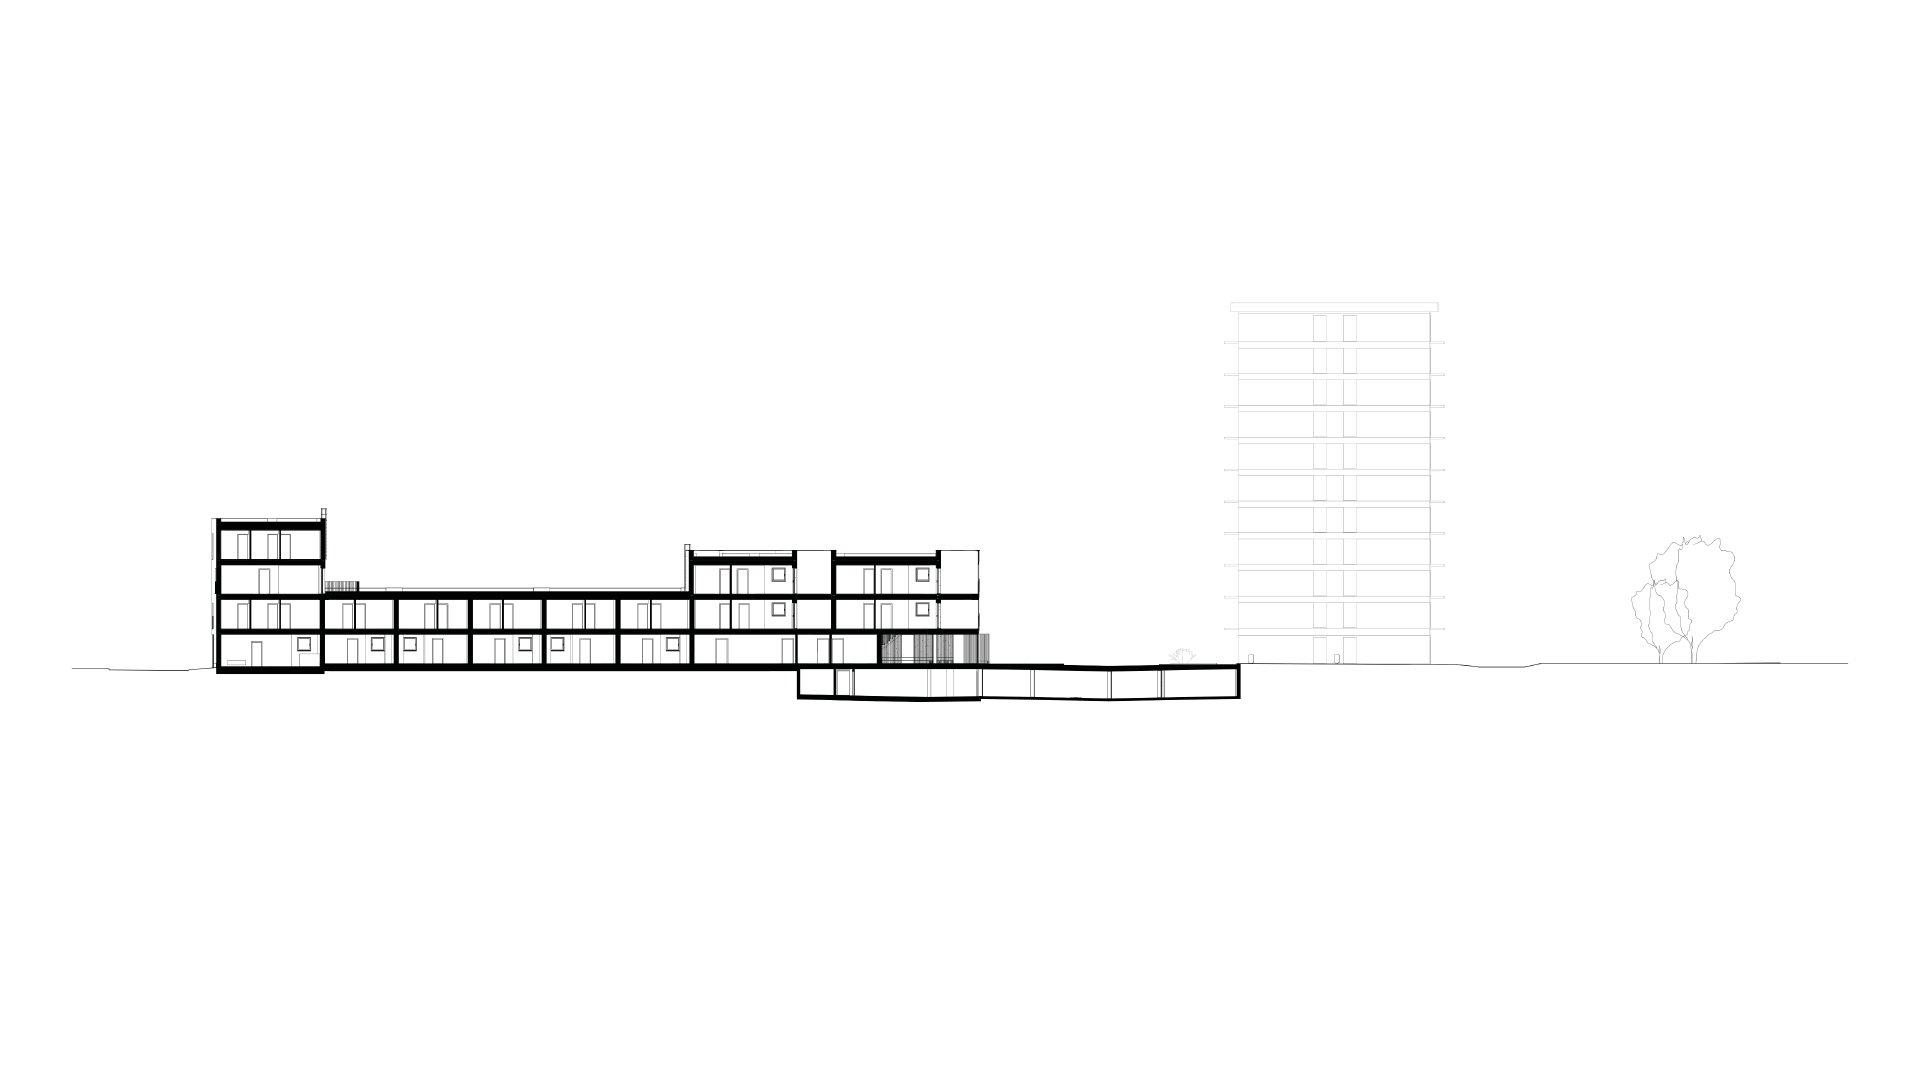 Rauter, collectieve woningen, Anderlecht-857726442